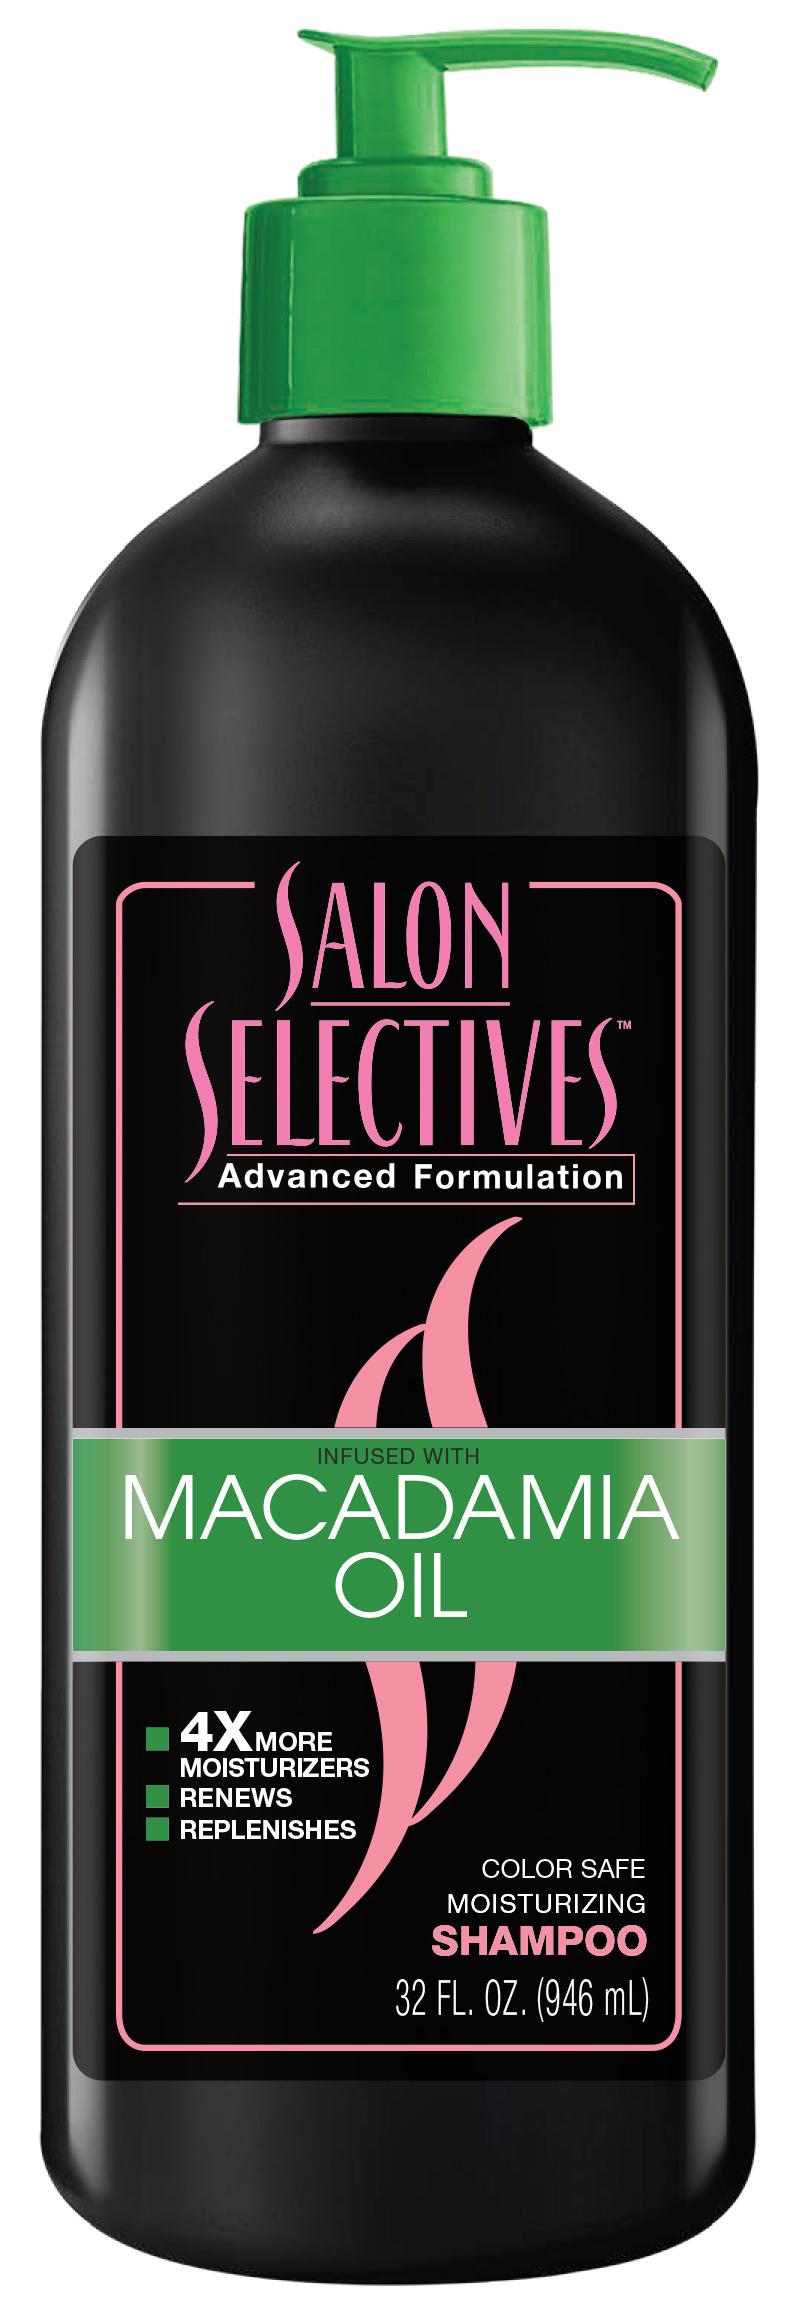 Salon Selectives Moisturising Conditioner Image